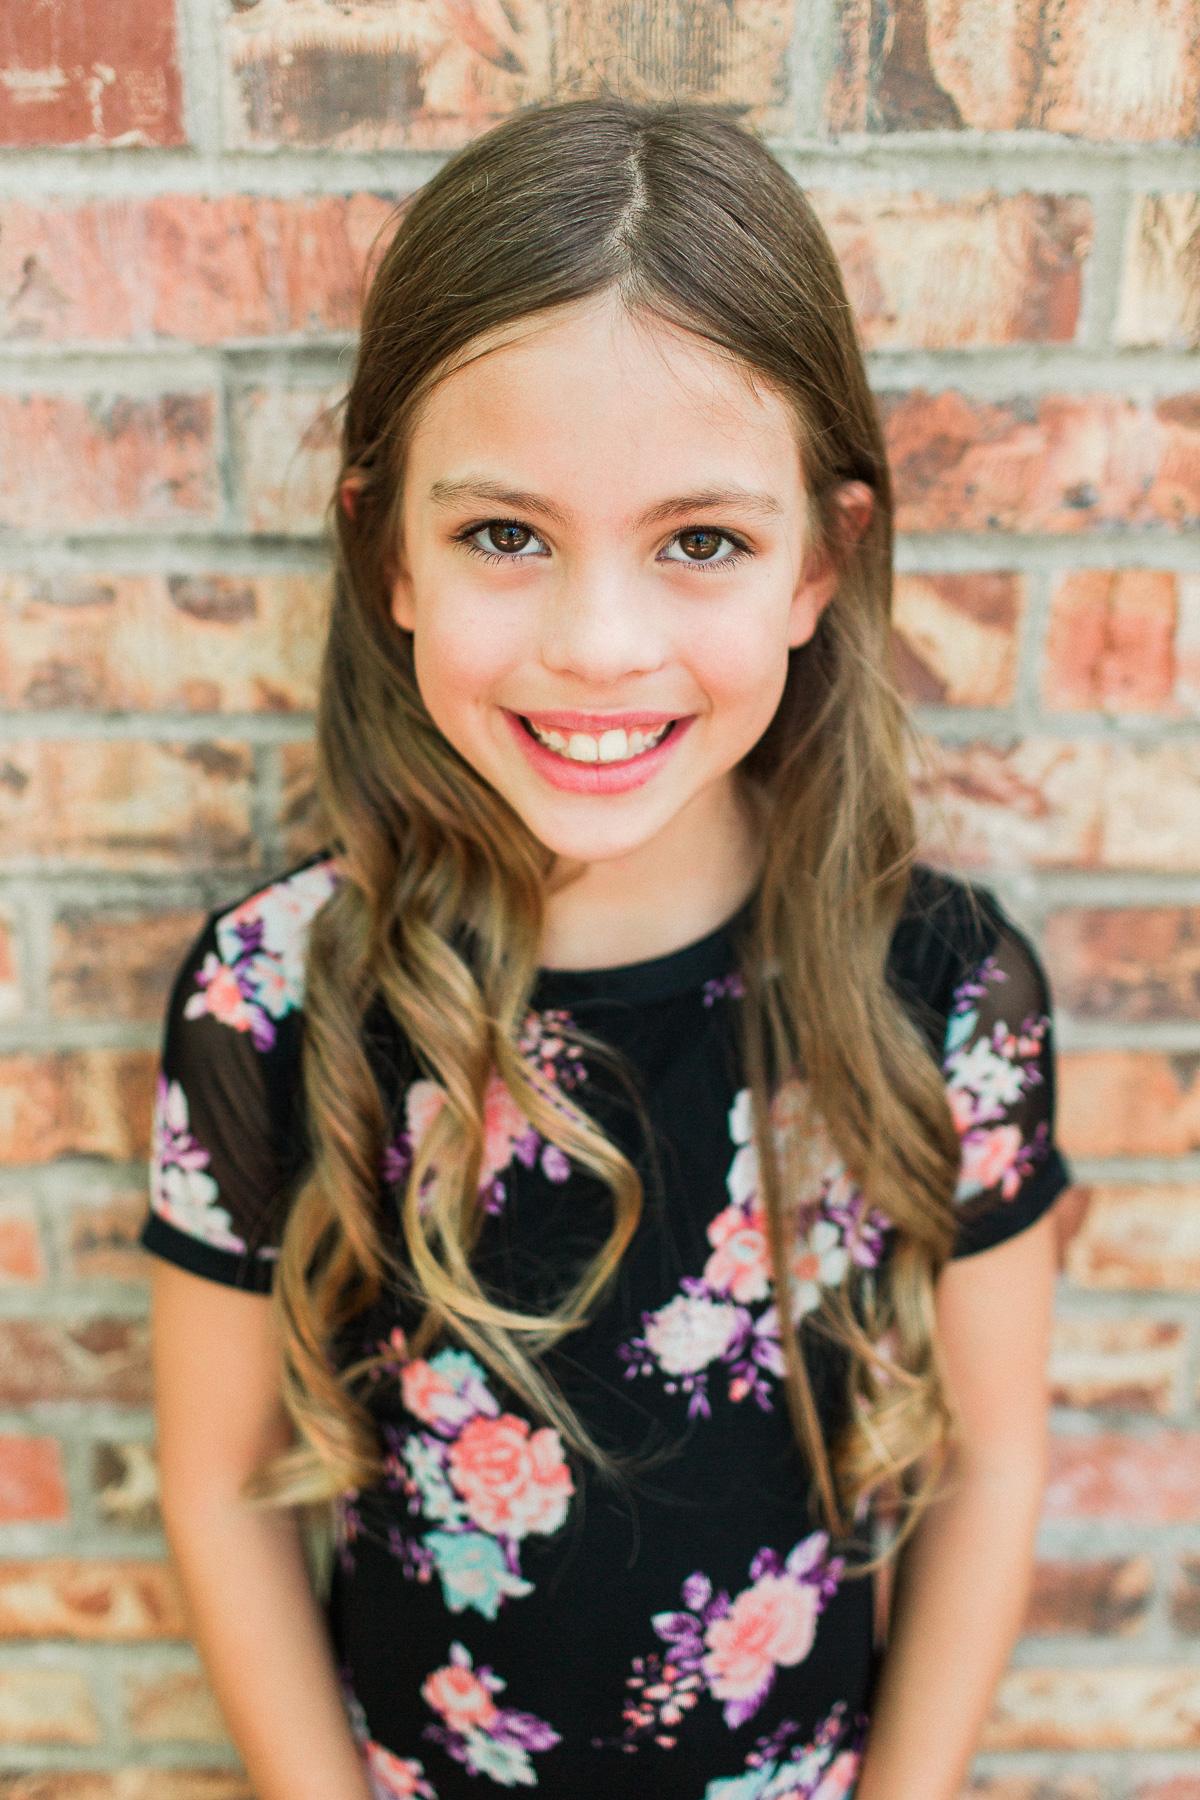 Homeschool daughter smiling